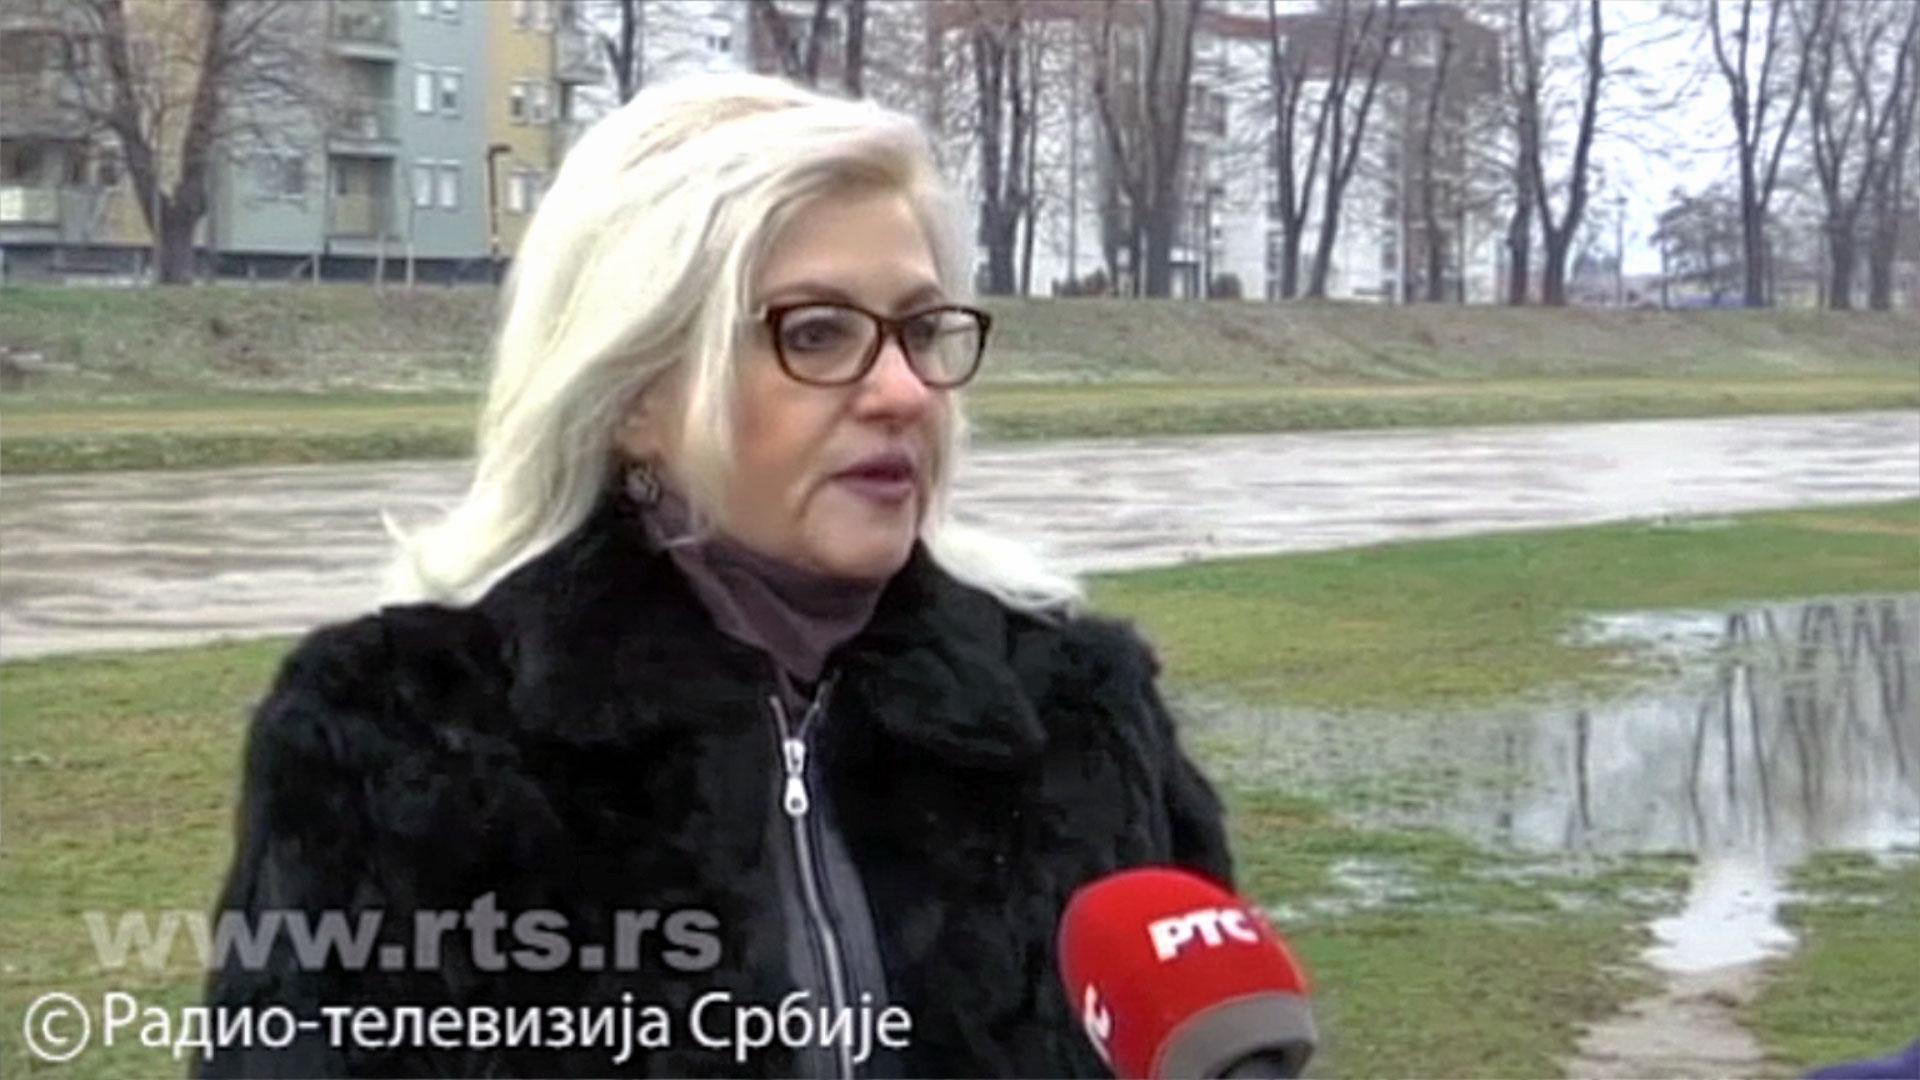 Smirujue se situacija sa polavama u Pirotskom okrugu